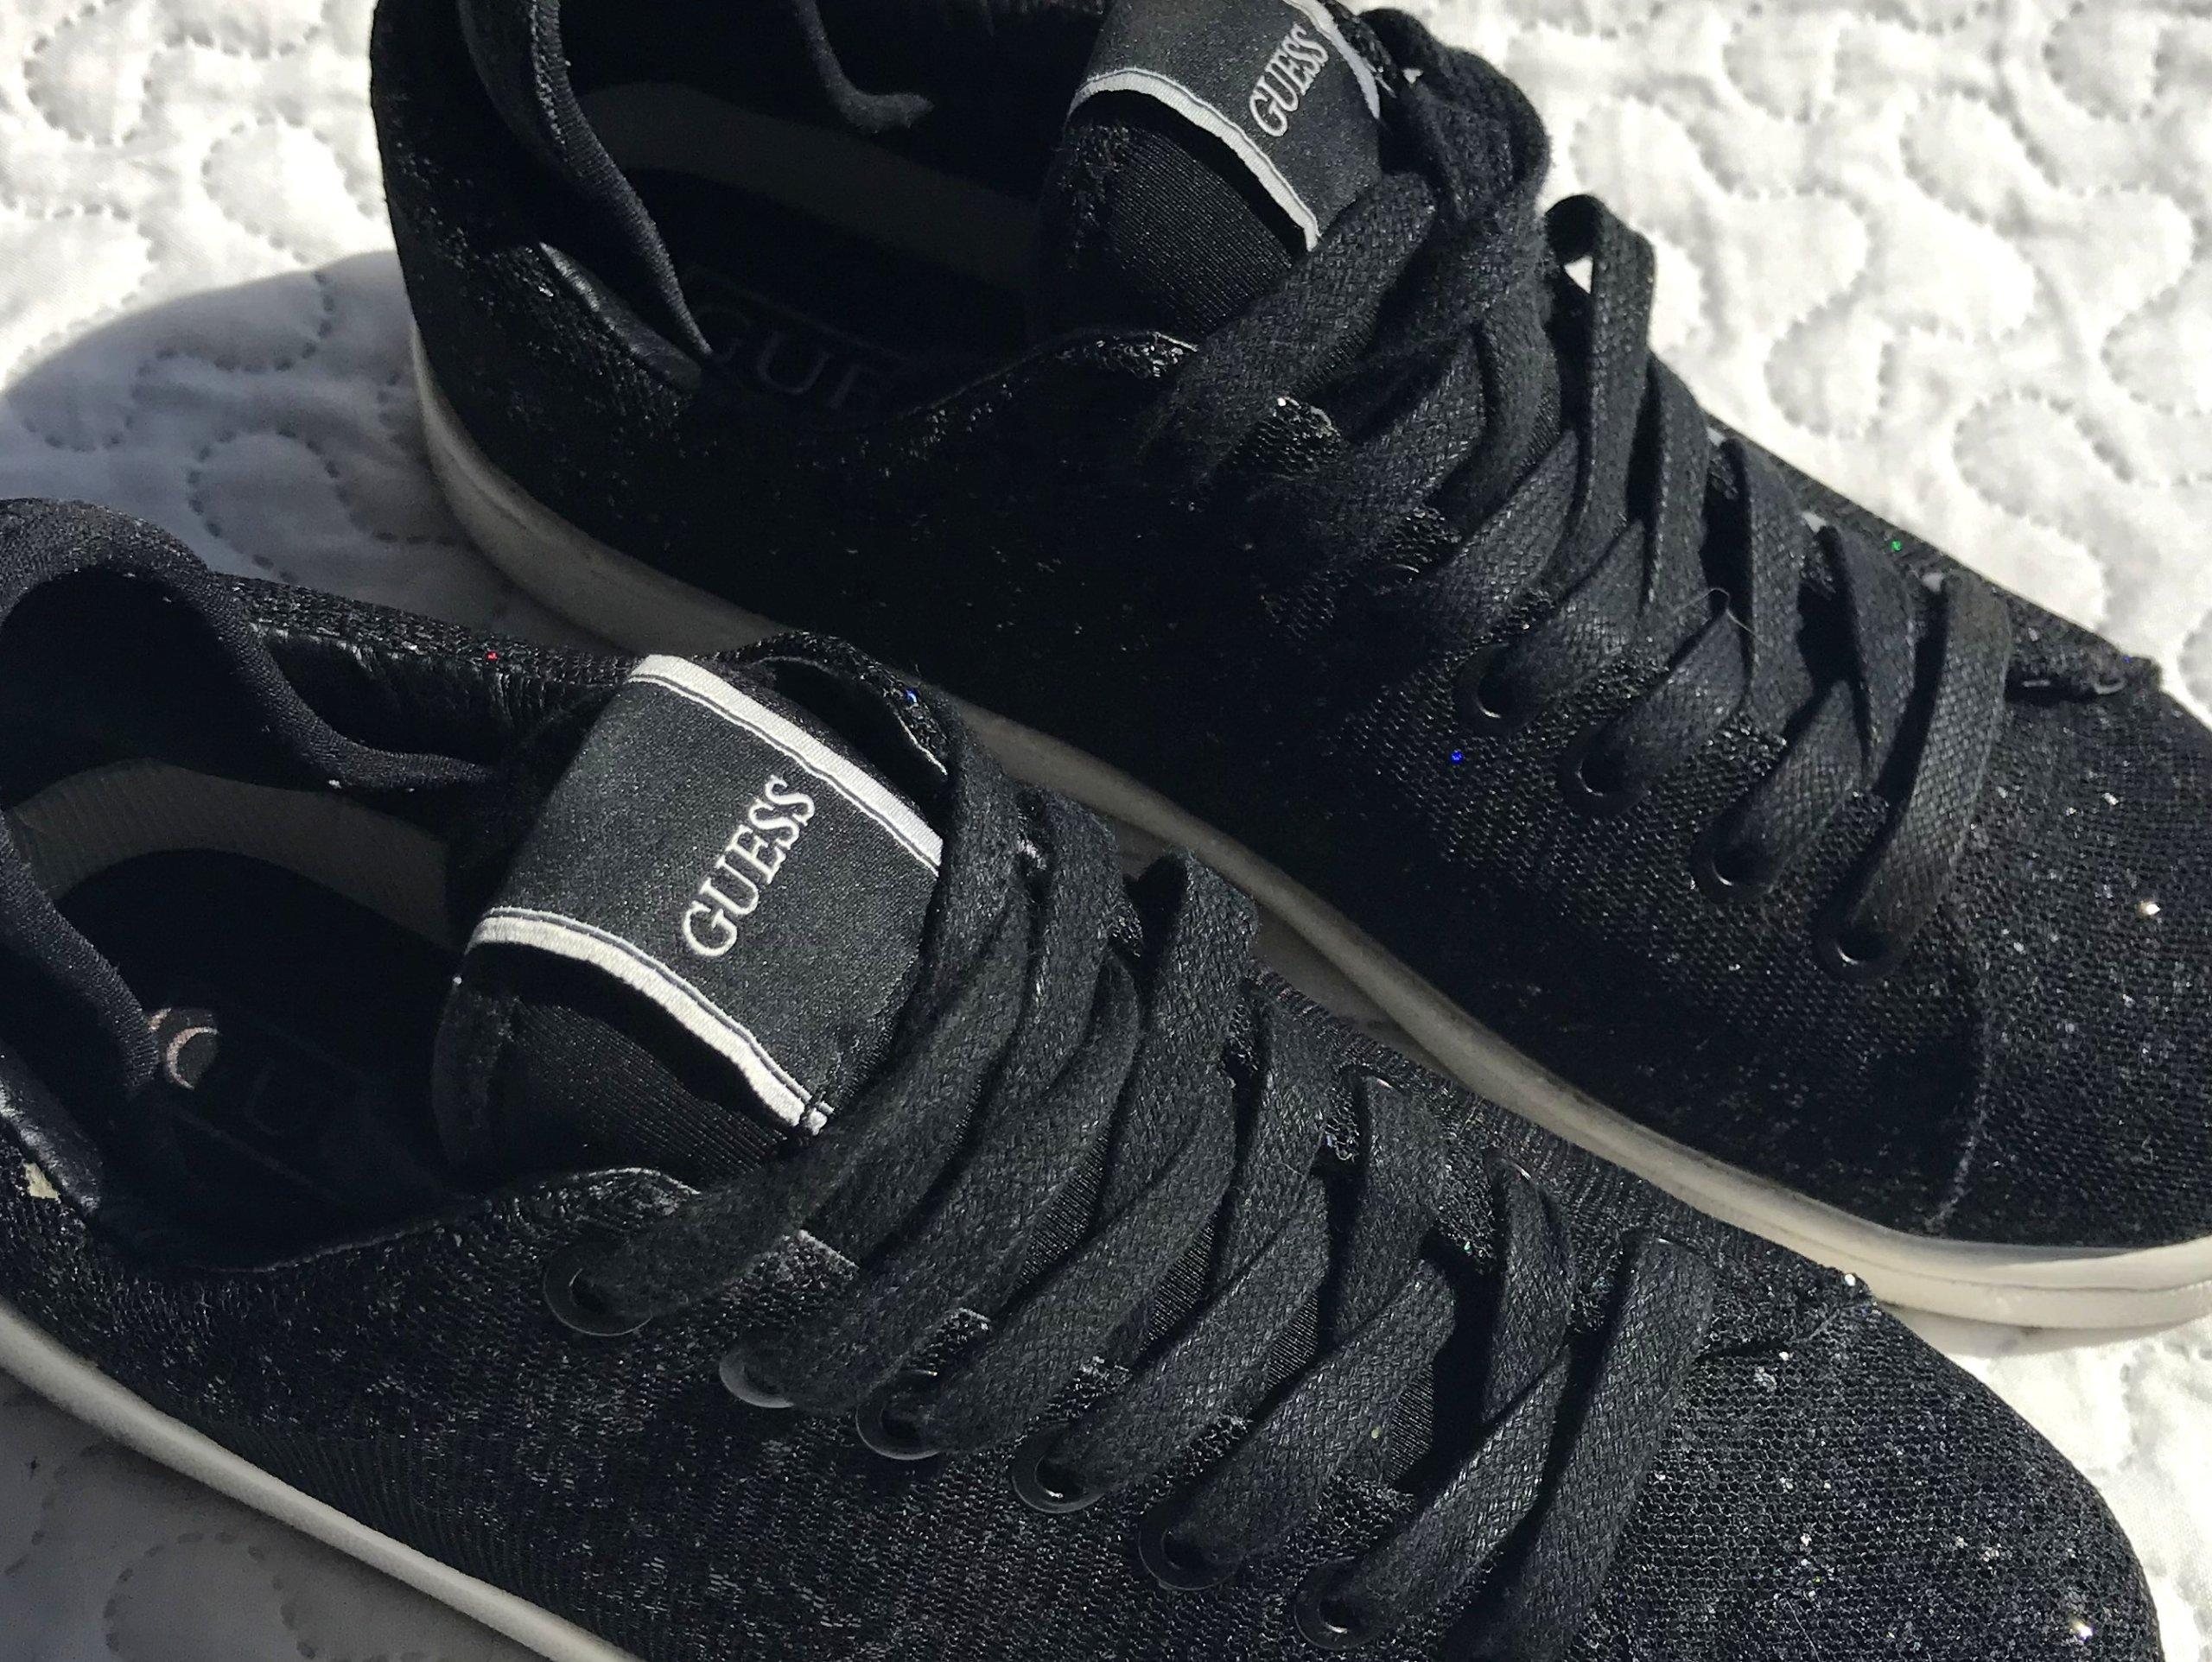 Masywnie Buty GUESS sneakersy adidasy brokat bling jak nowe - 7307958201 RQ64